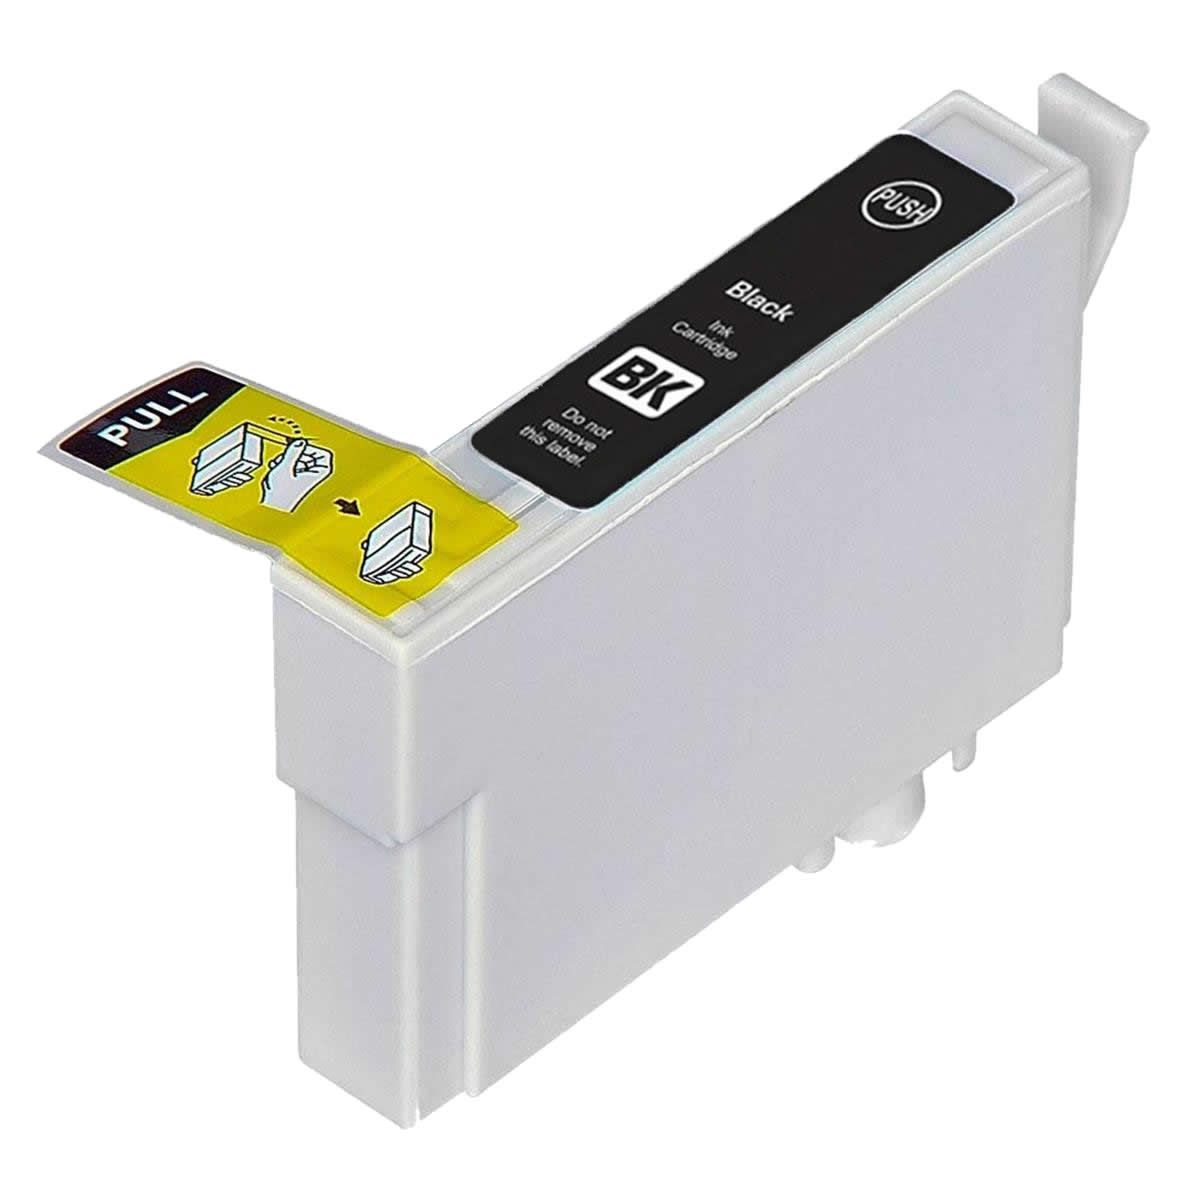 Cartucho TO481 Preto Compatível para Epson R200 R220 R300 R320 R340 R500 R600 RX500 RX600 RX620 RX640